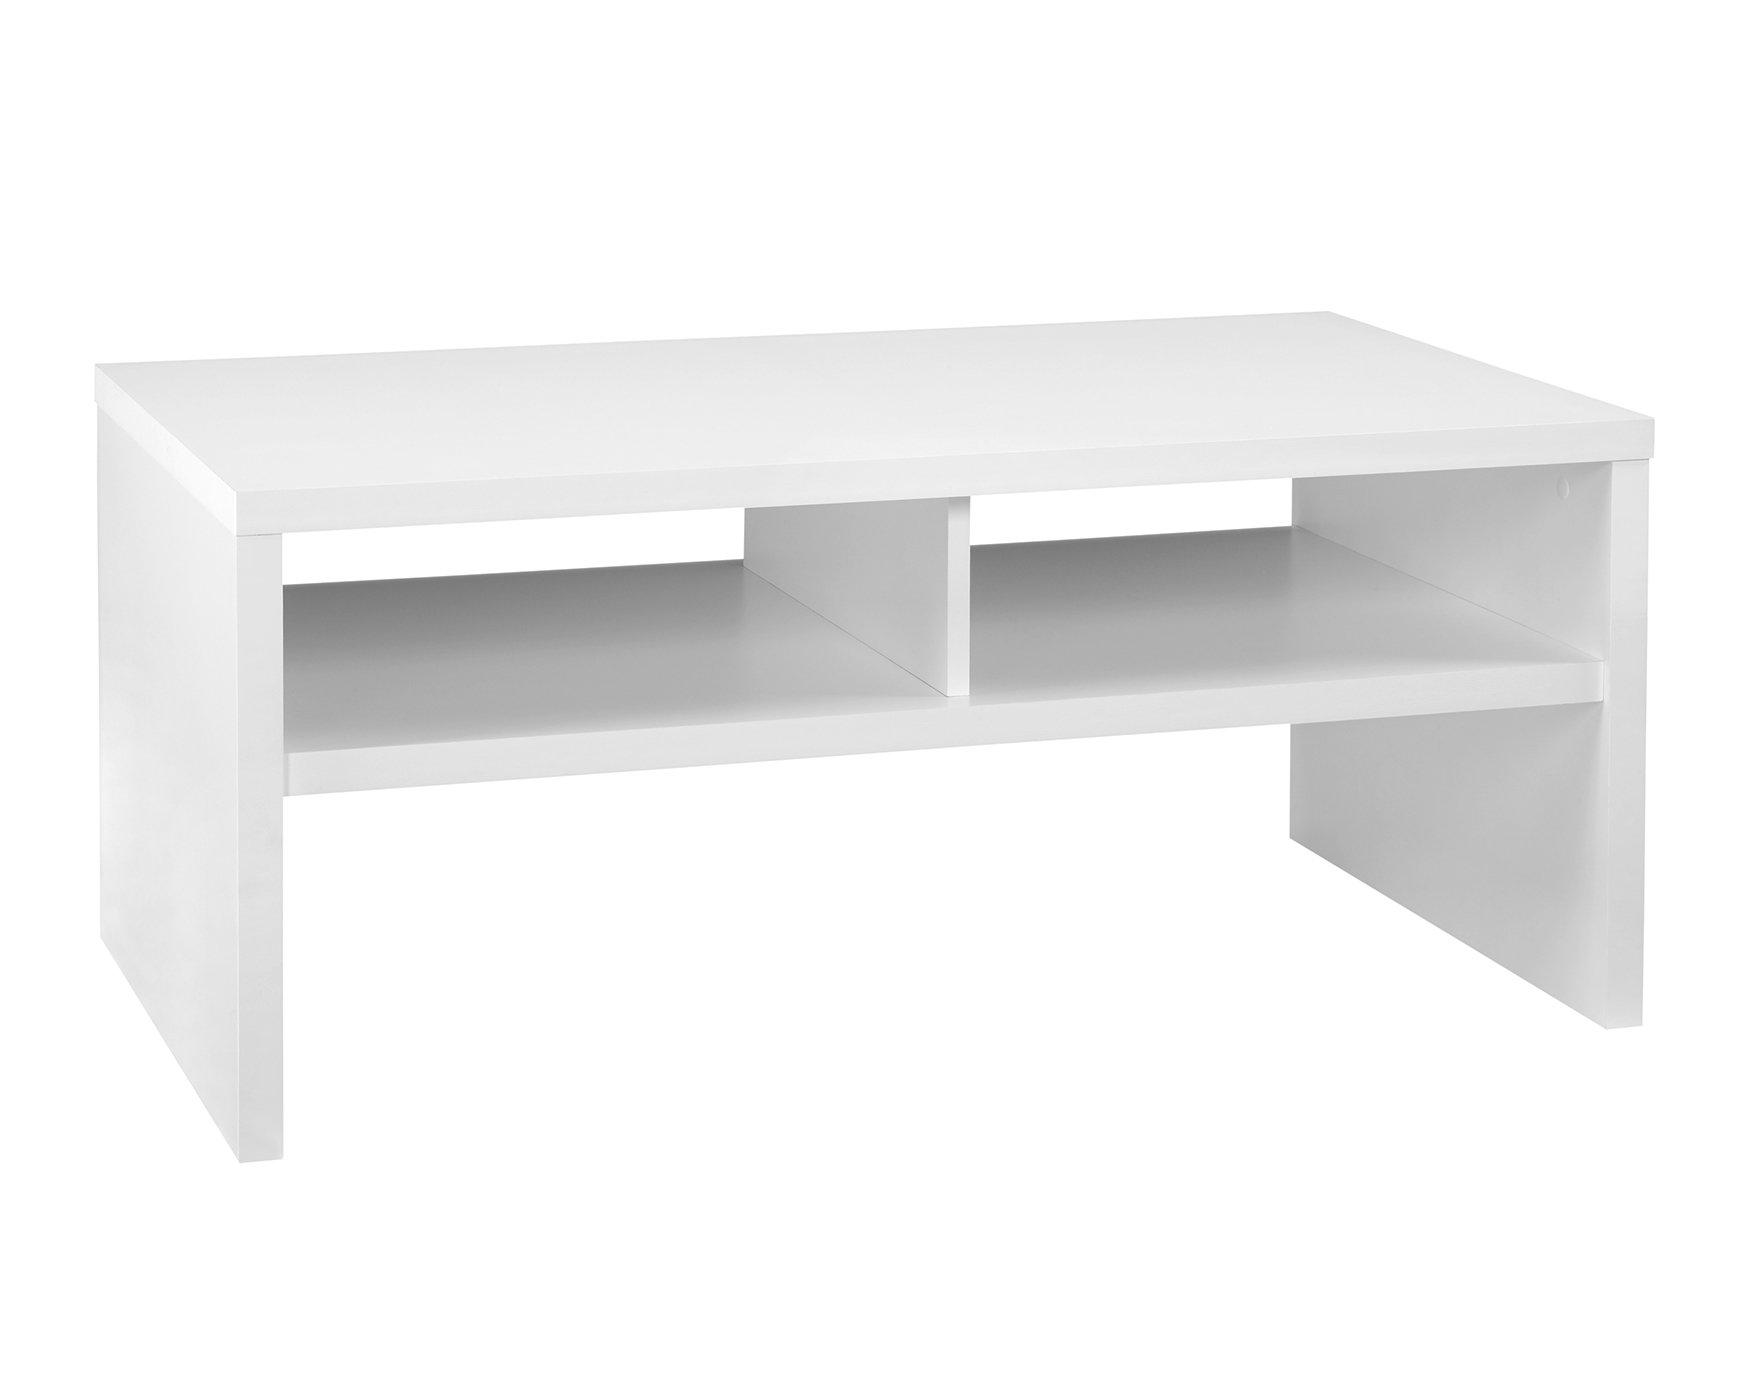 ClosetMaid 1654 Rectangular Coffee Table with Storage Shelves, White